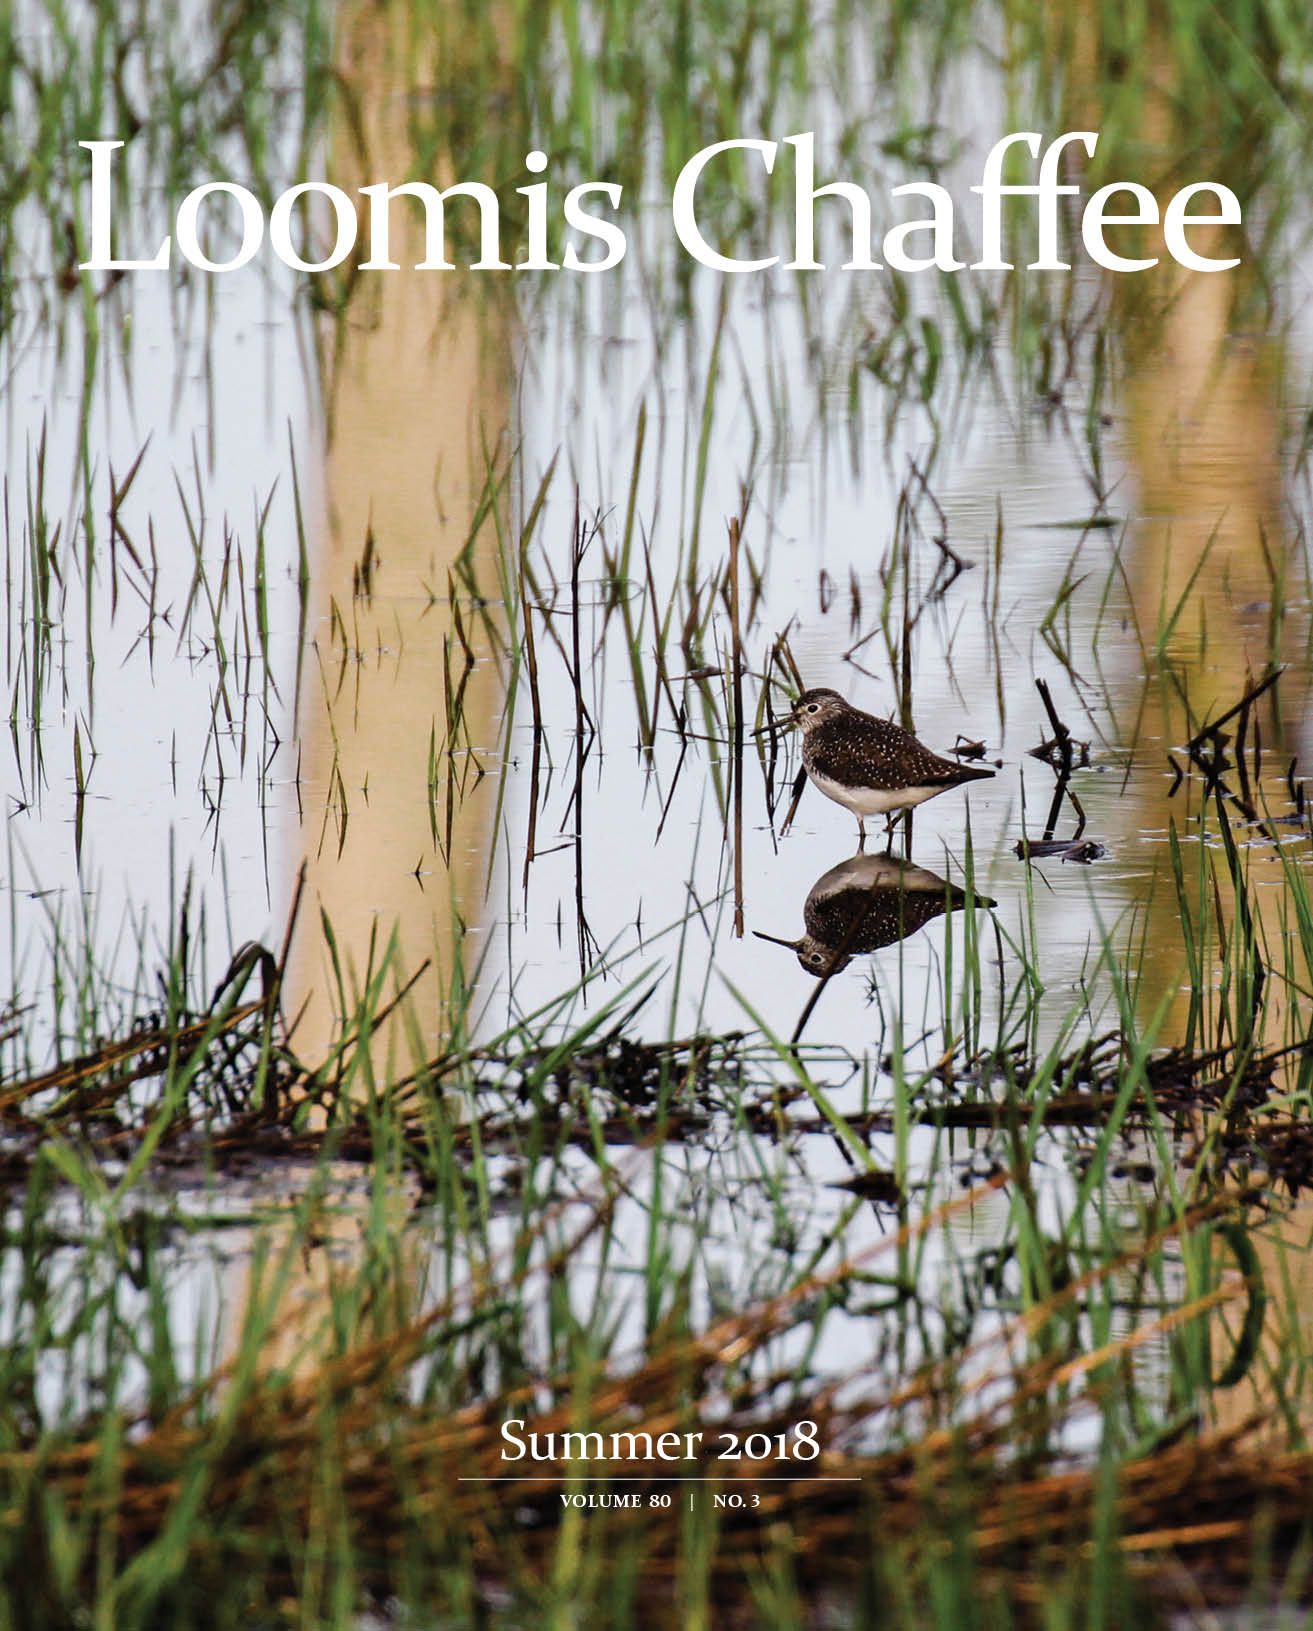 Loomis Chaffee Magazine Summer 2018